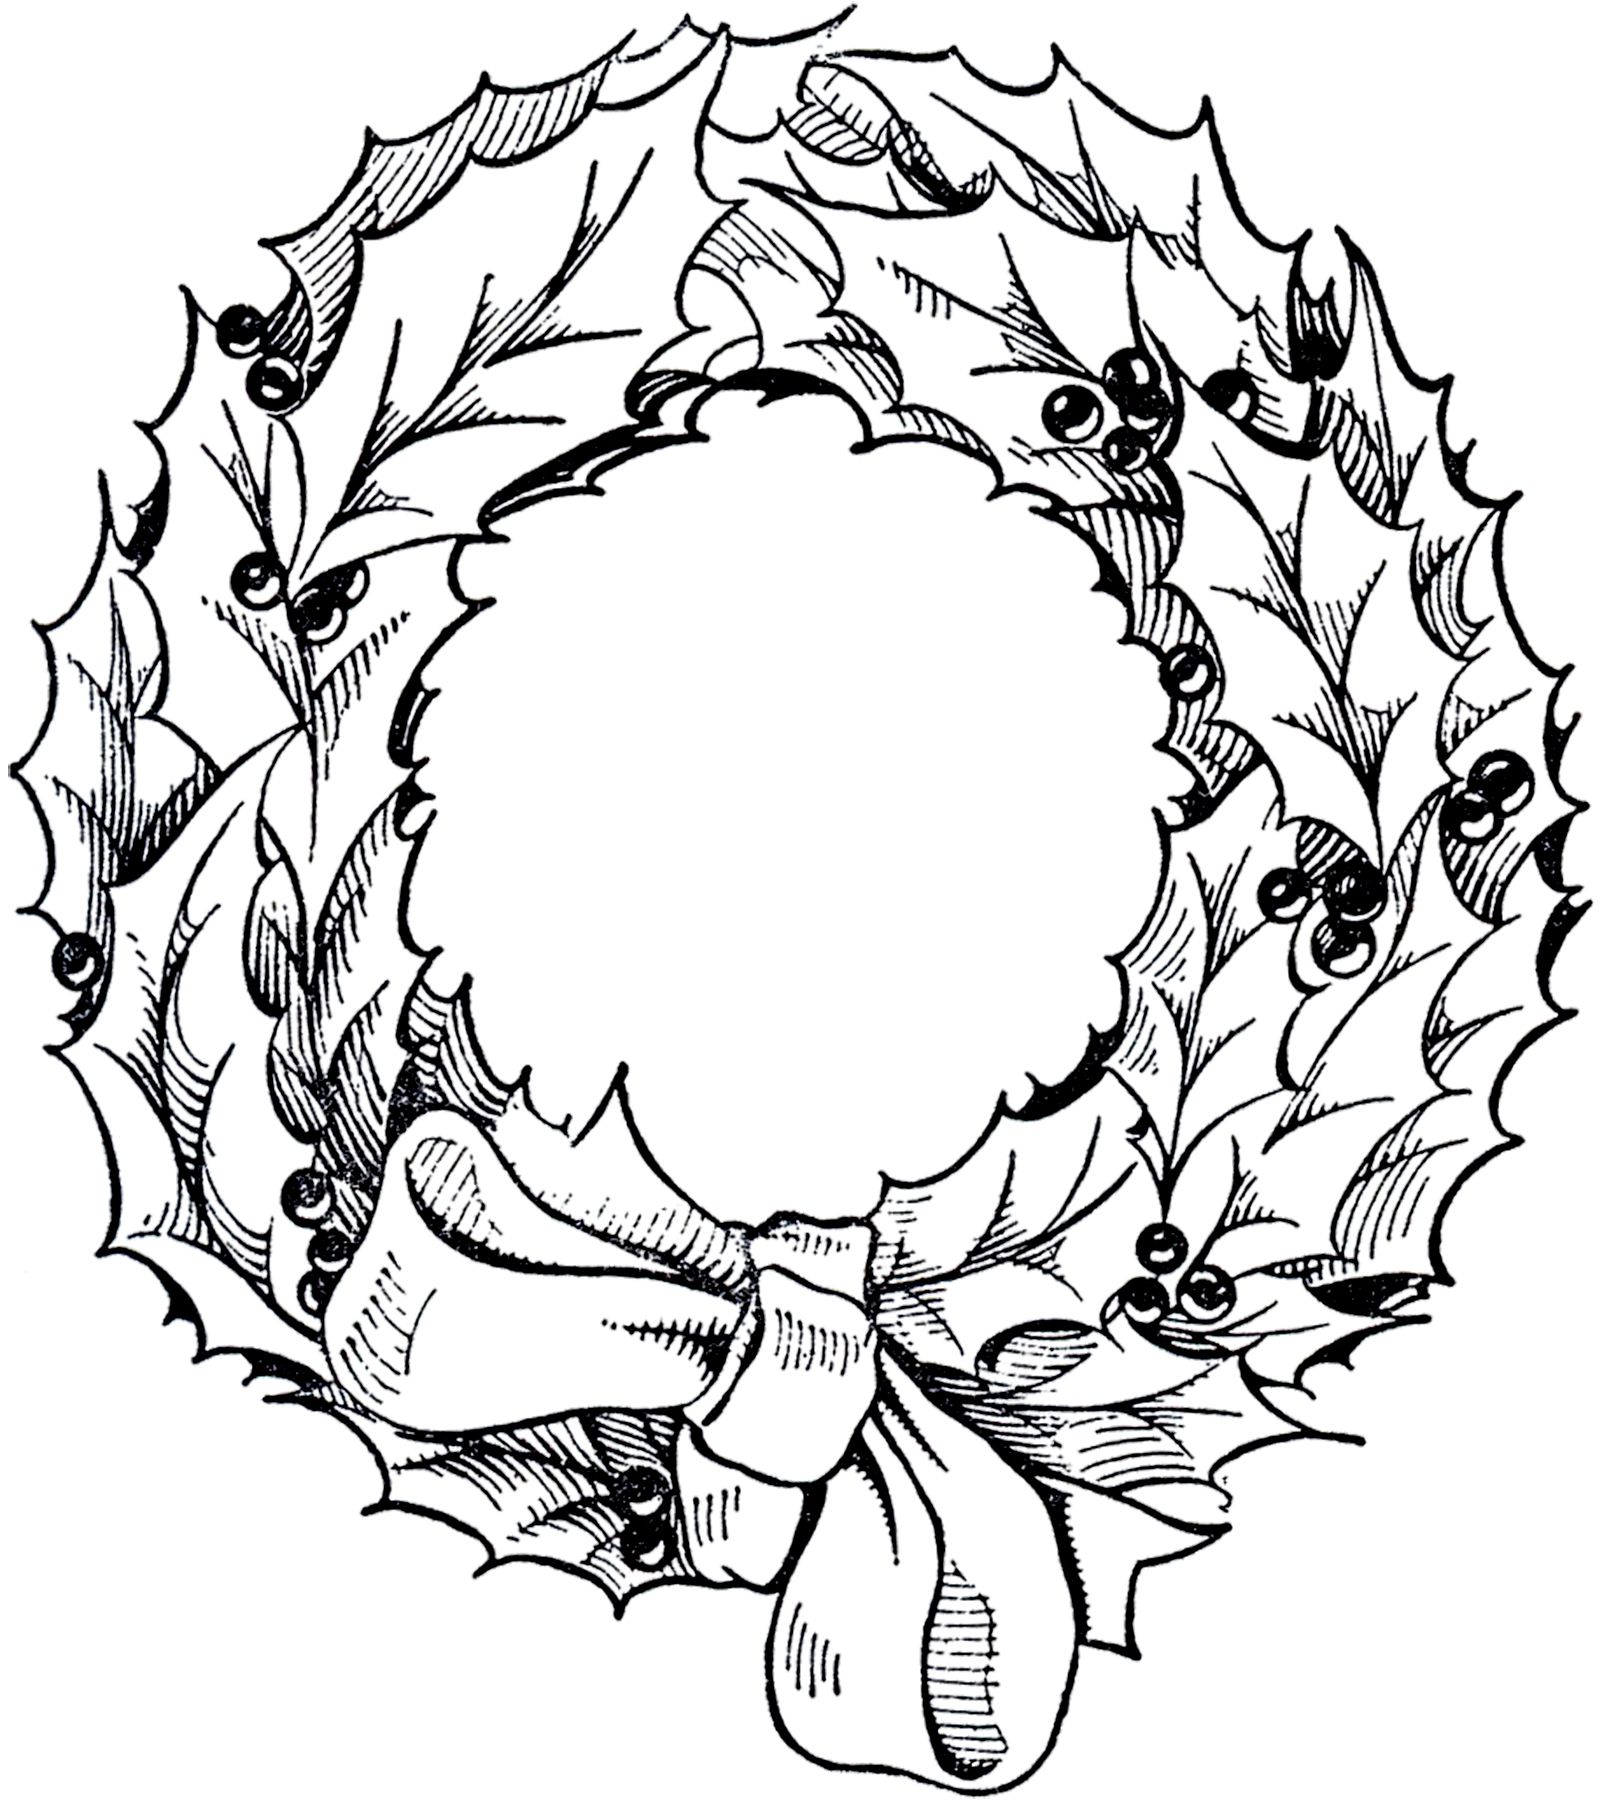 Vintage Christmas Wreath Graphic.